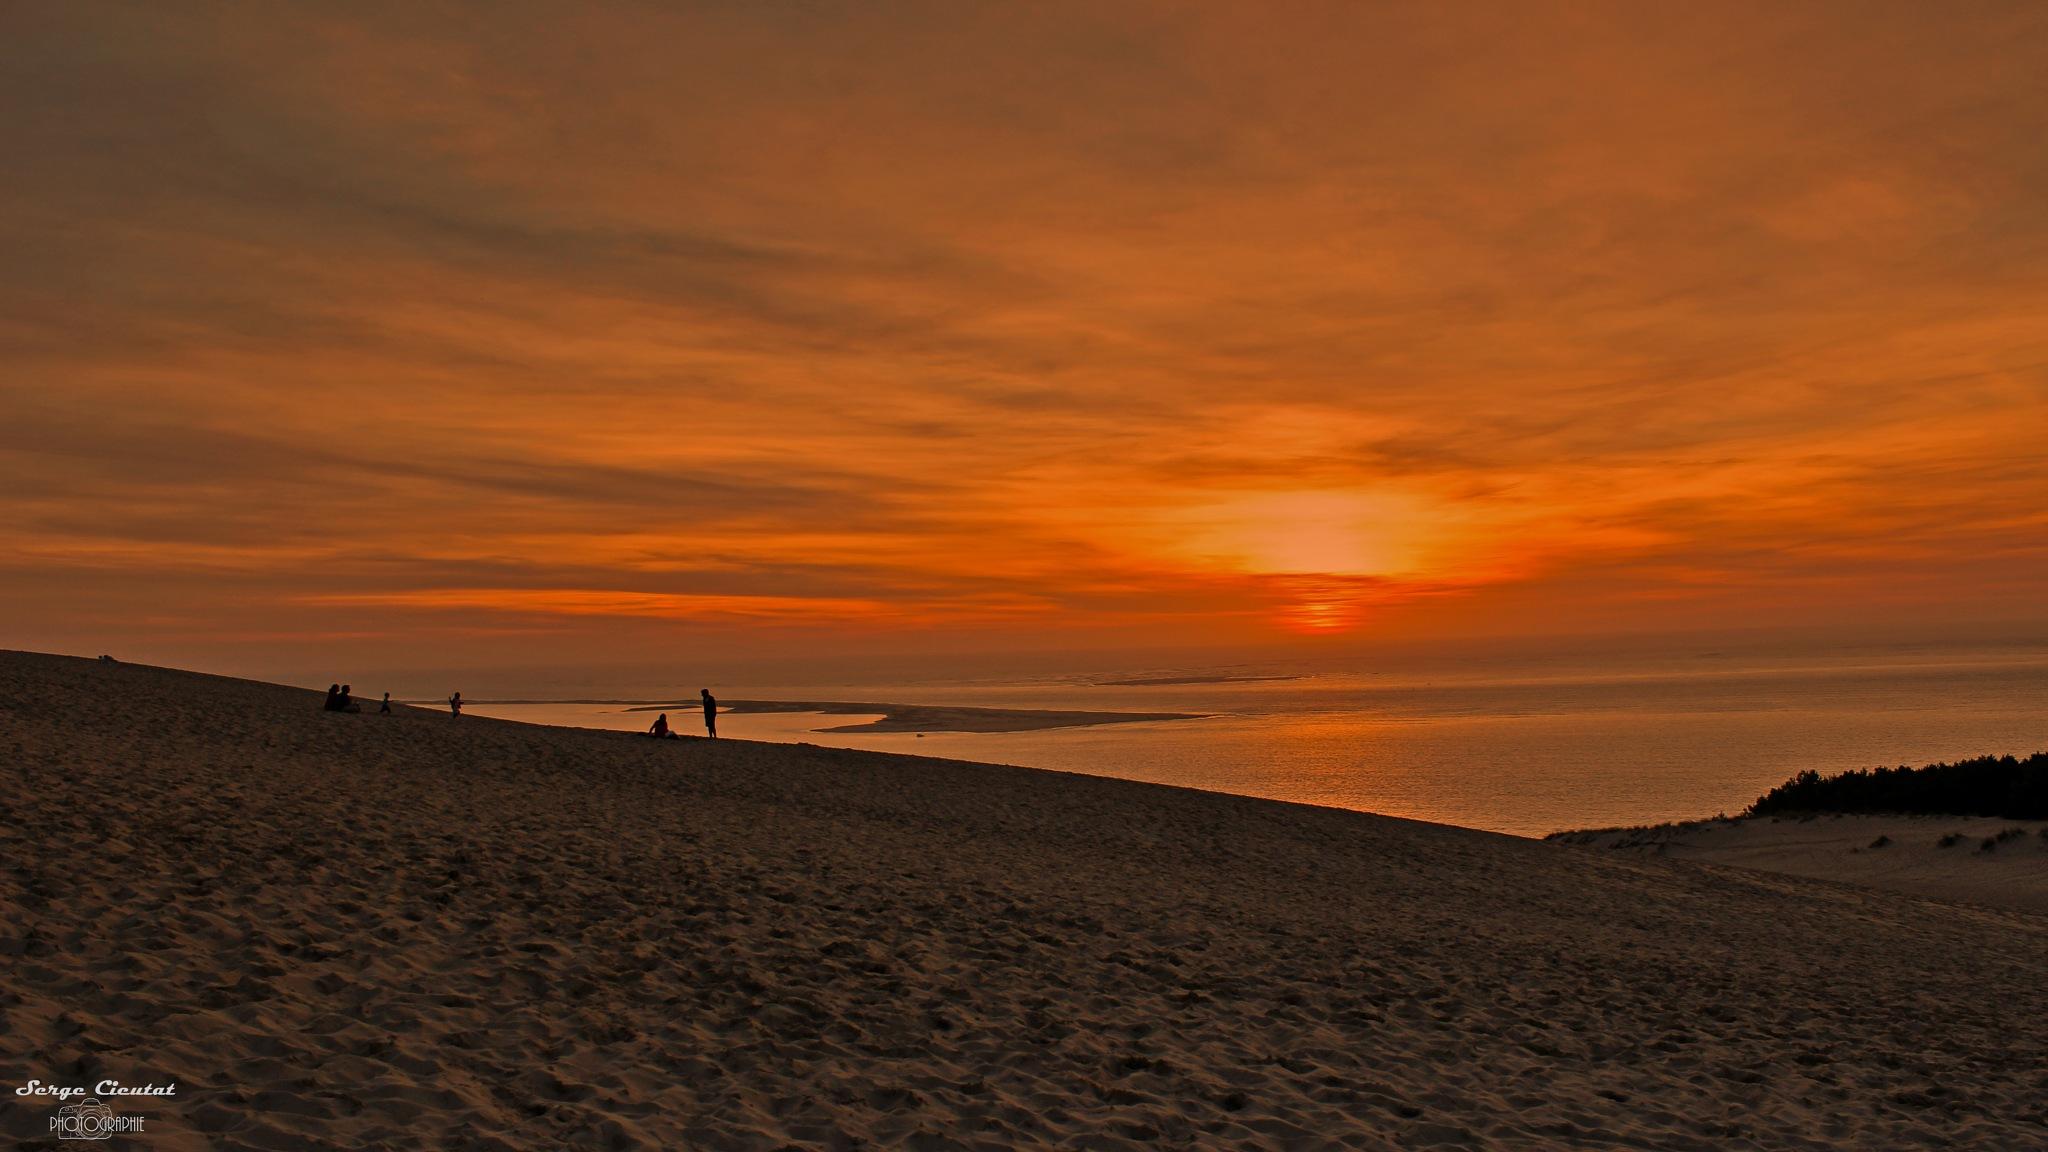 dune du Pilat by Cieutat serge